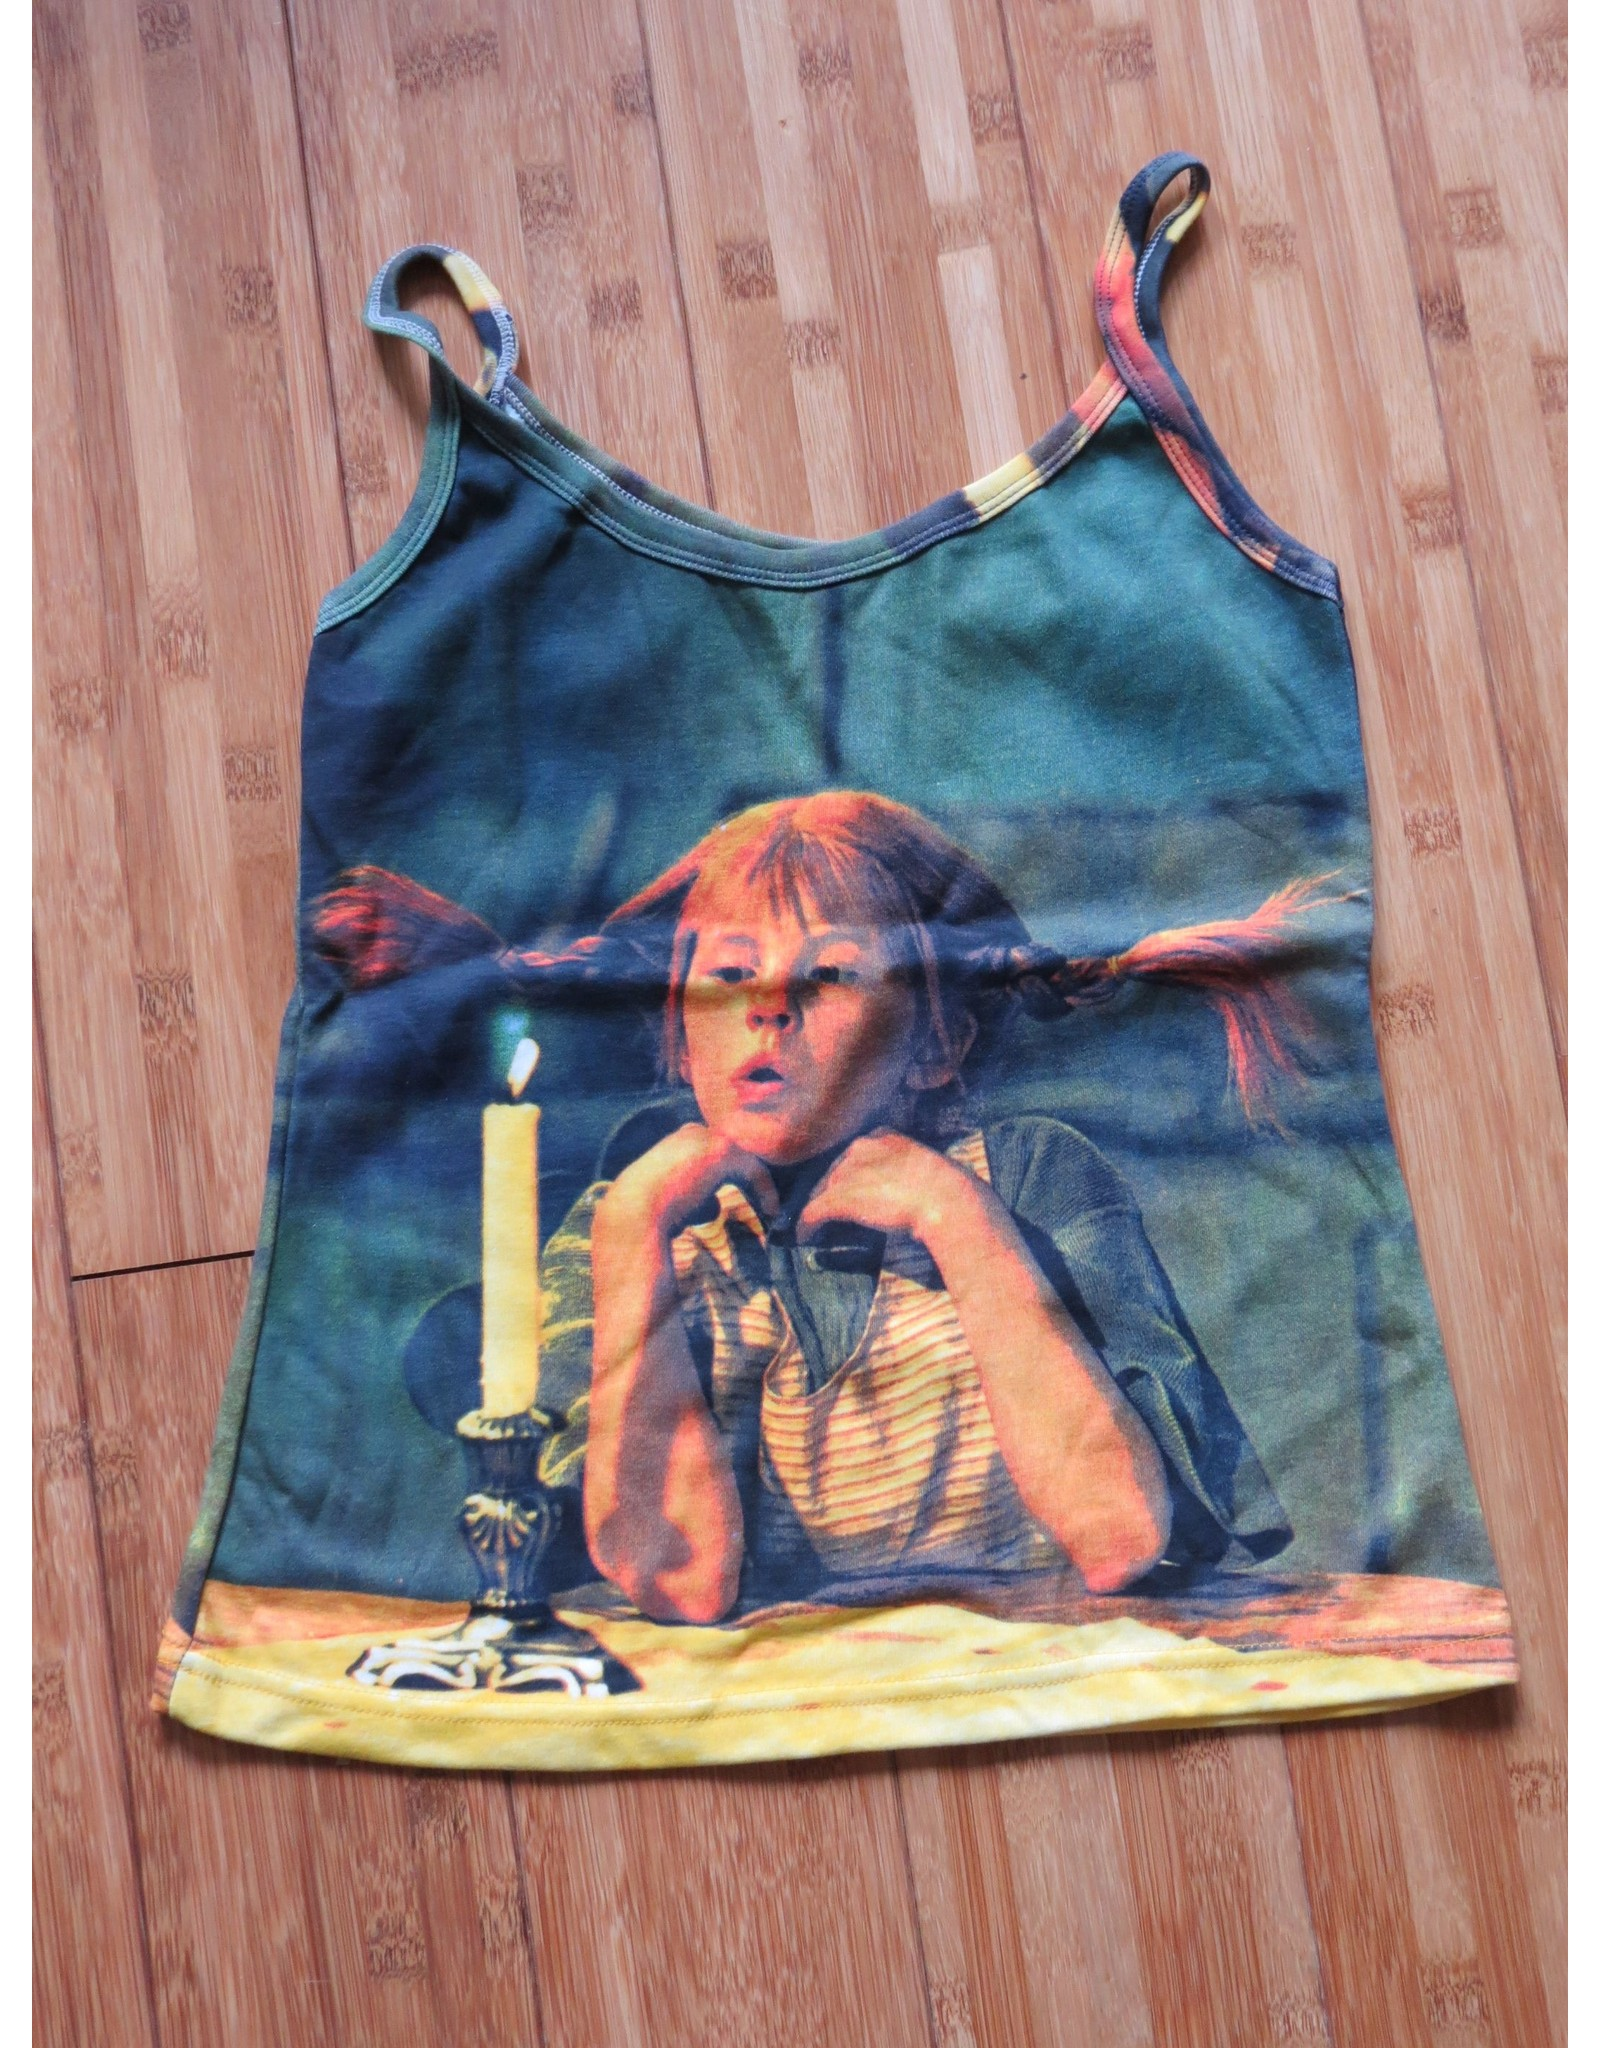 Pippi Langkous Adult tshirt - Pippi pondering